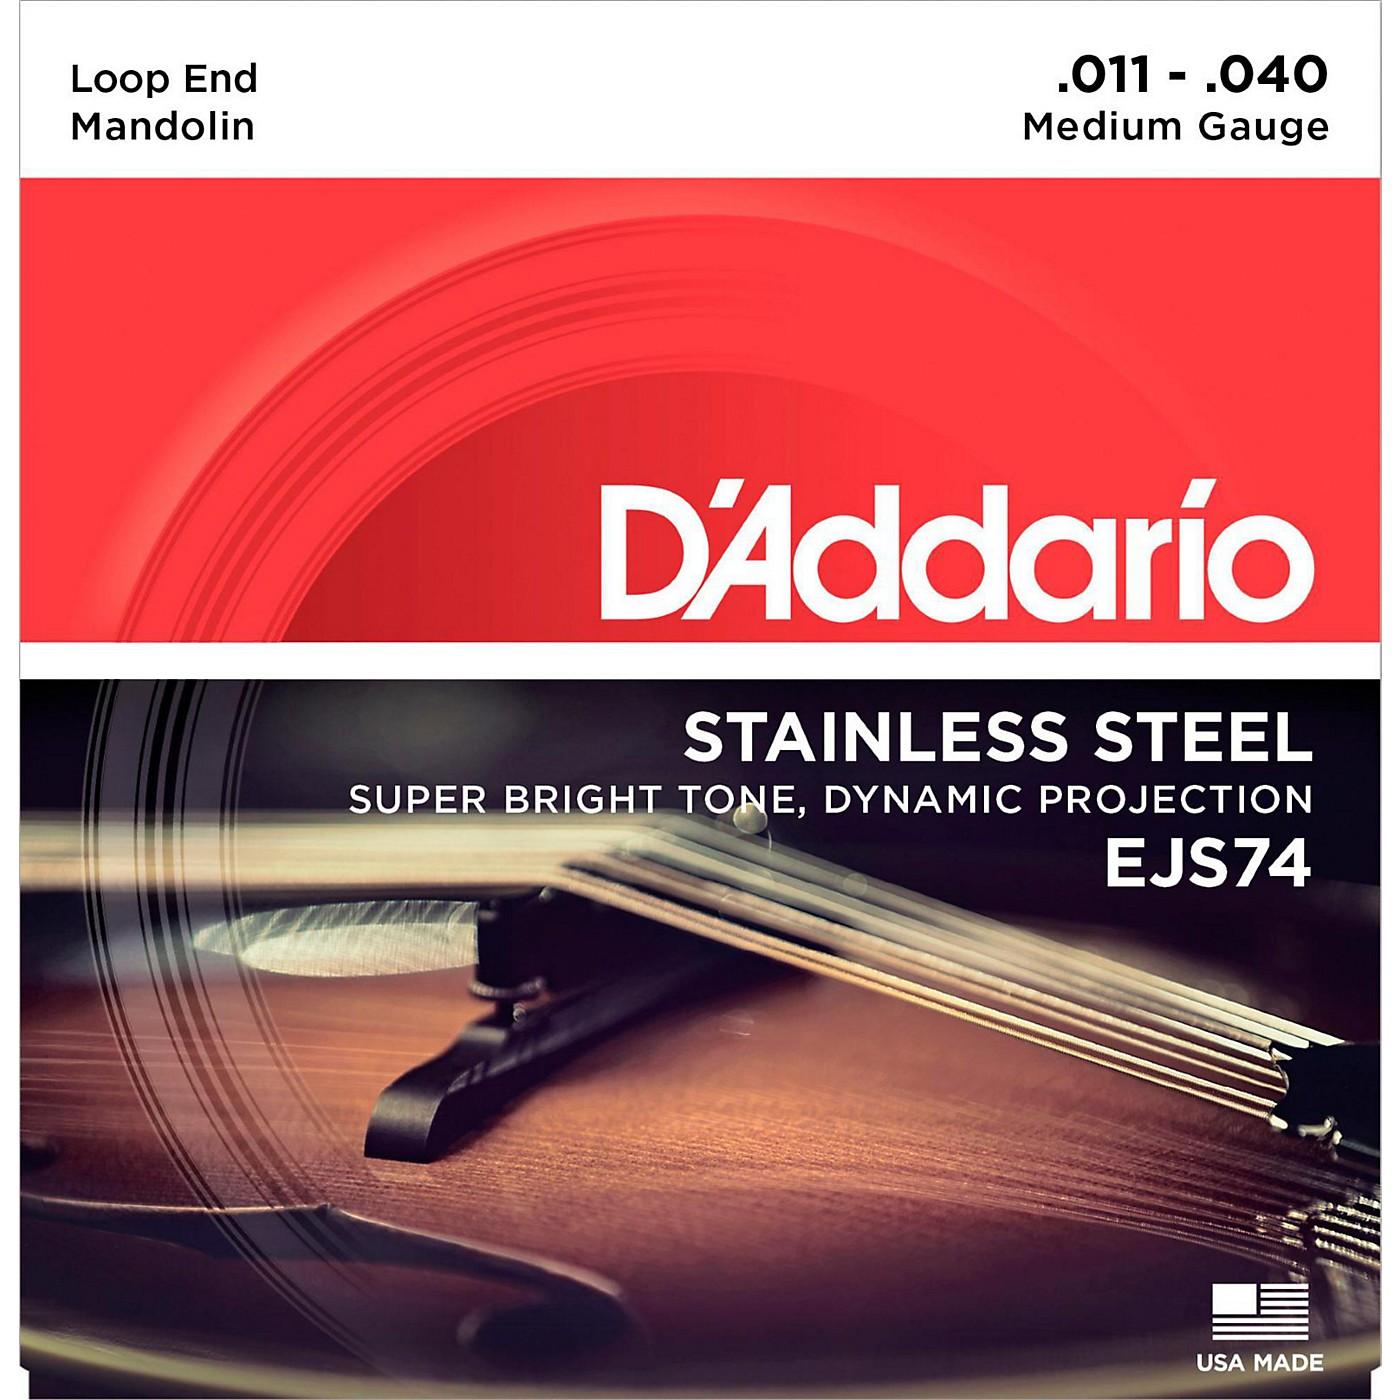 D'Addario EJS74 Stainless Steel Medium Mandolin Strings (11-40) thumbnail